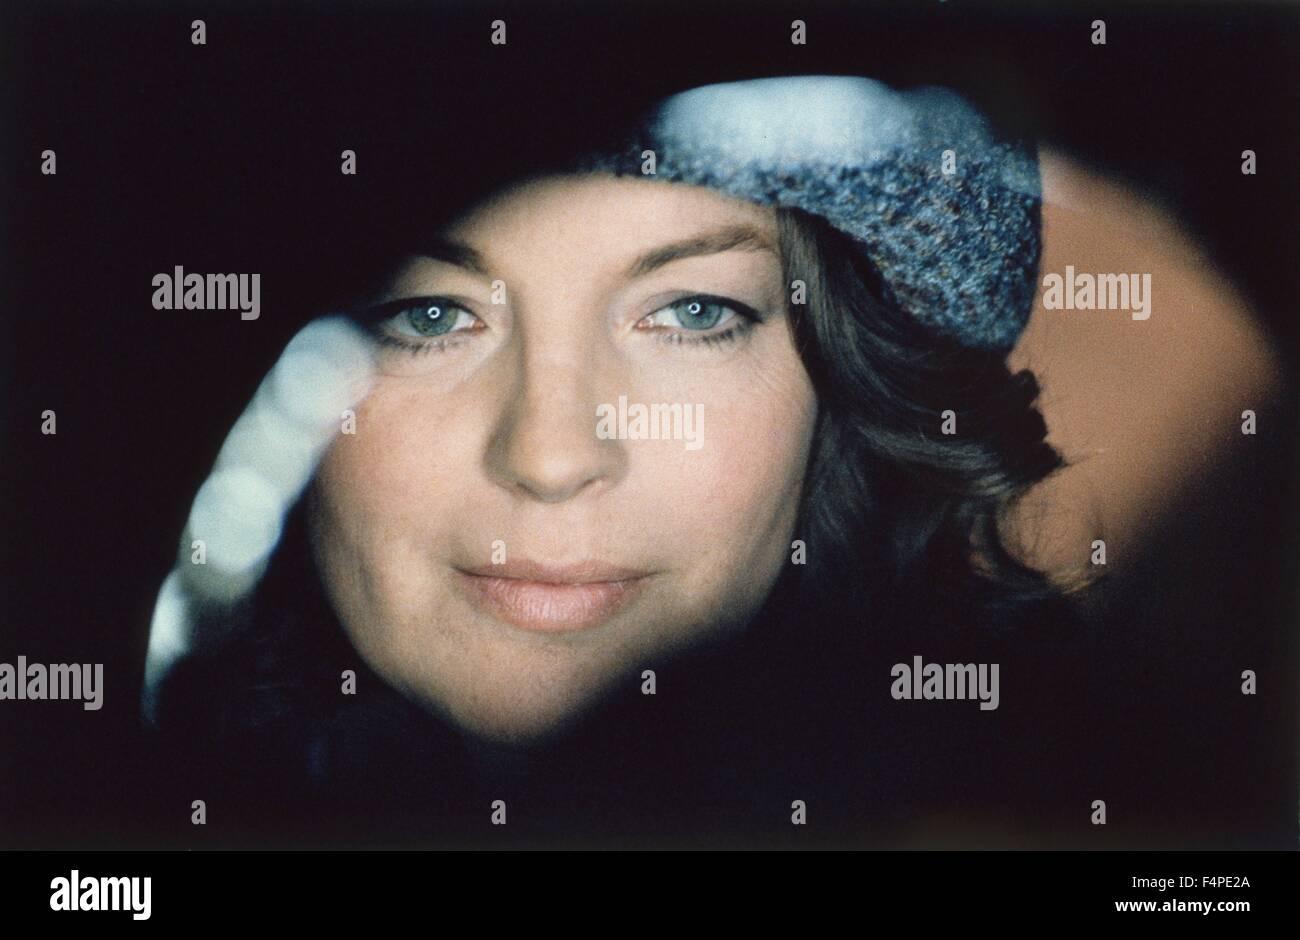 Romy Schneider / Phantom Love / 1981 directed by Dino Risi - Stock Image